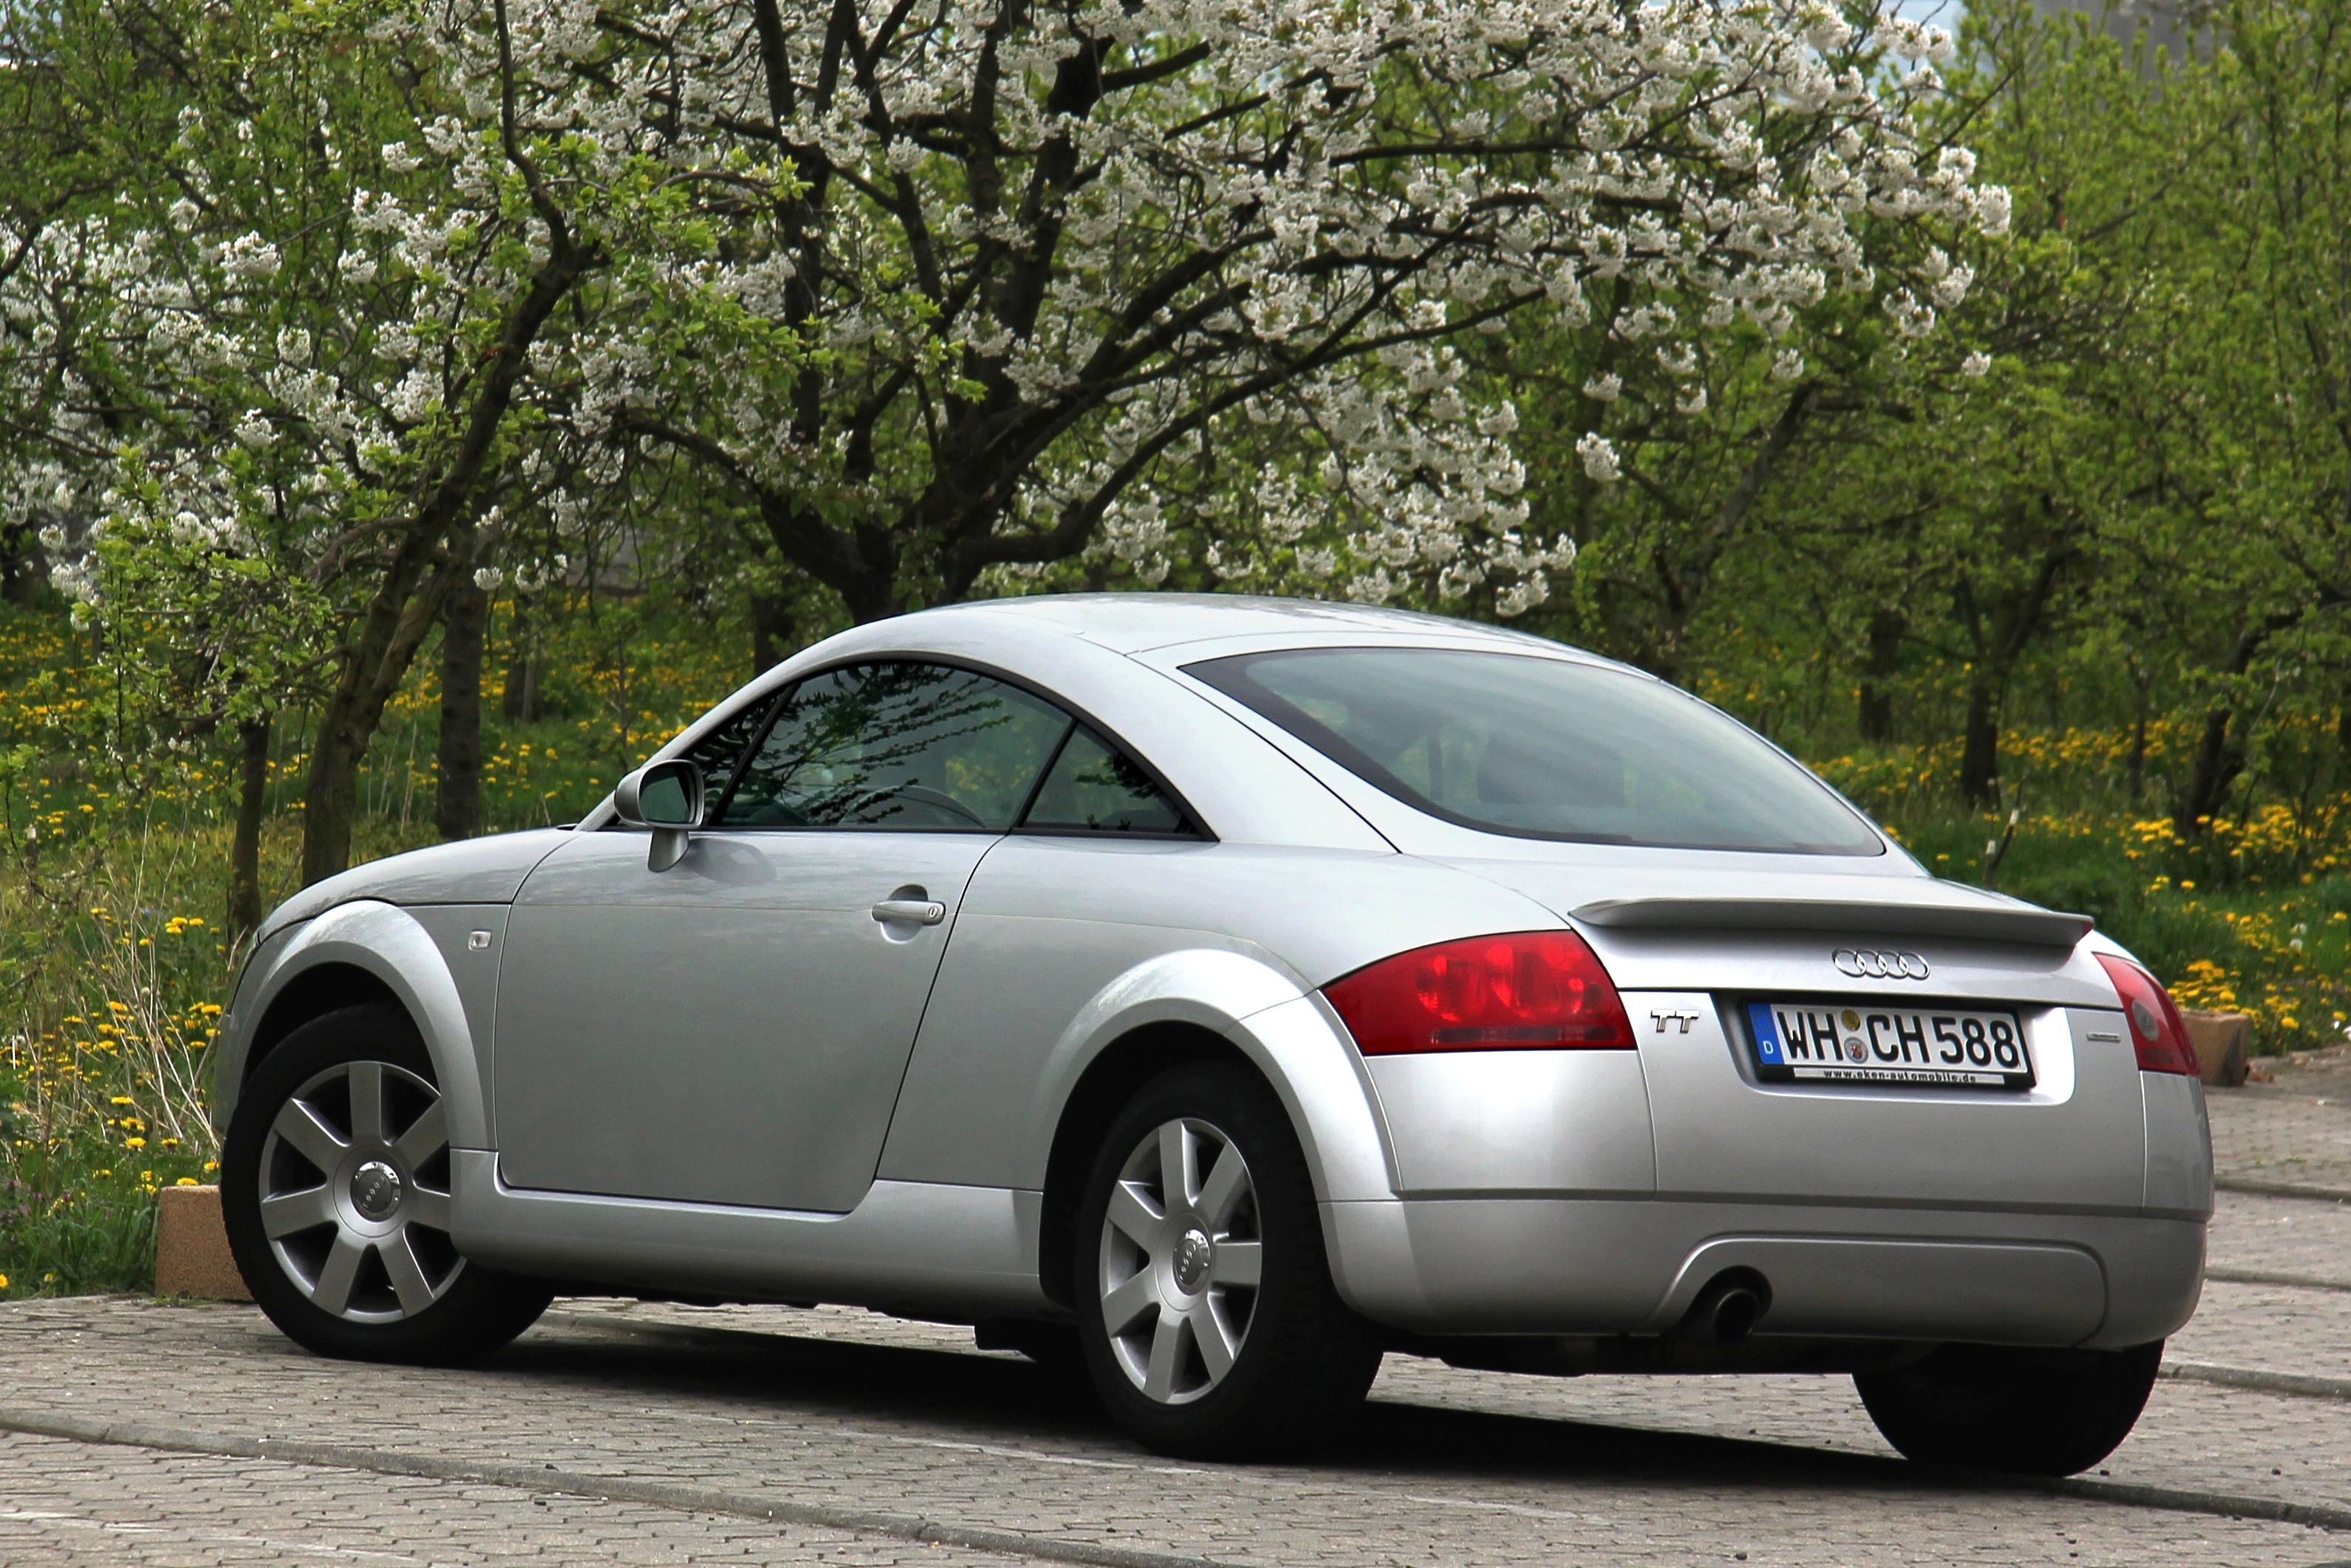 File:Audi TT Heck (Sp 2013-04-30 B).JPG - Wikimedia Commons